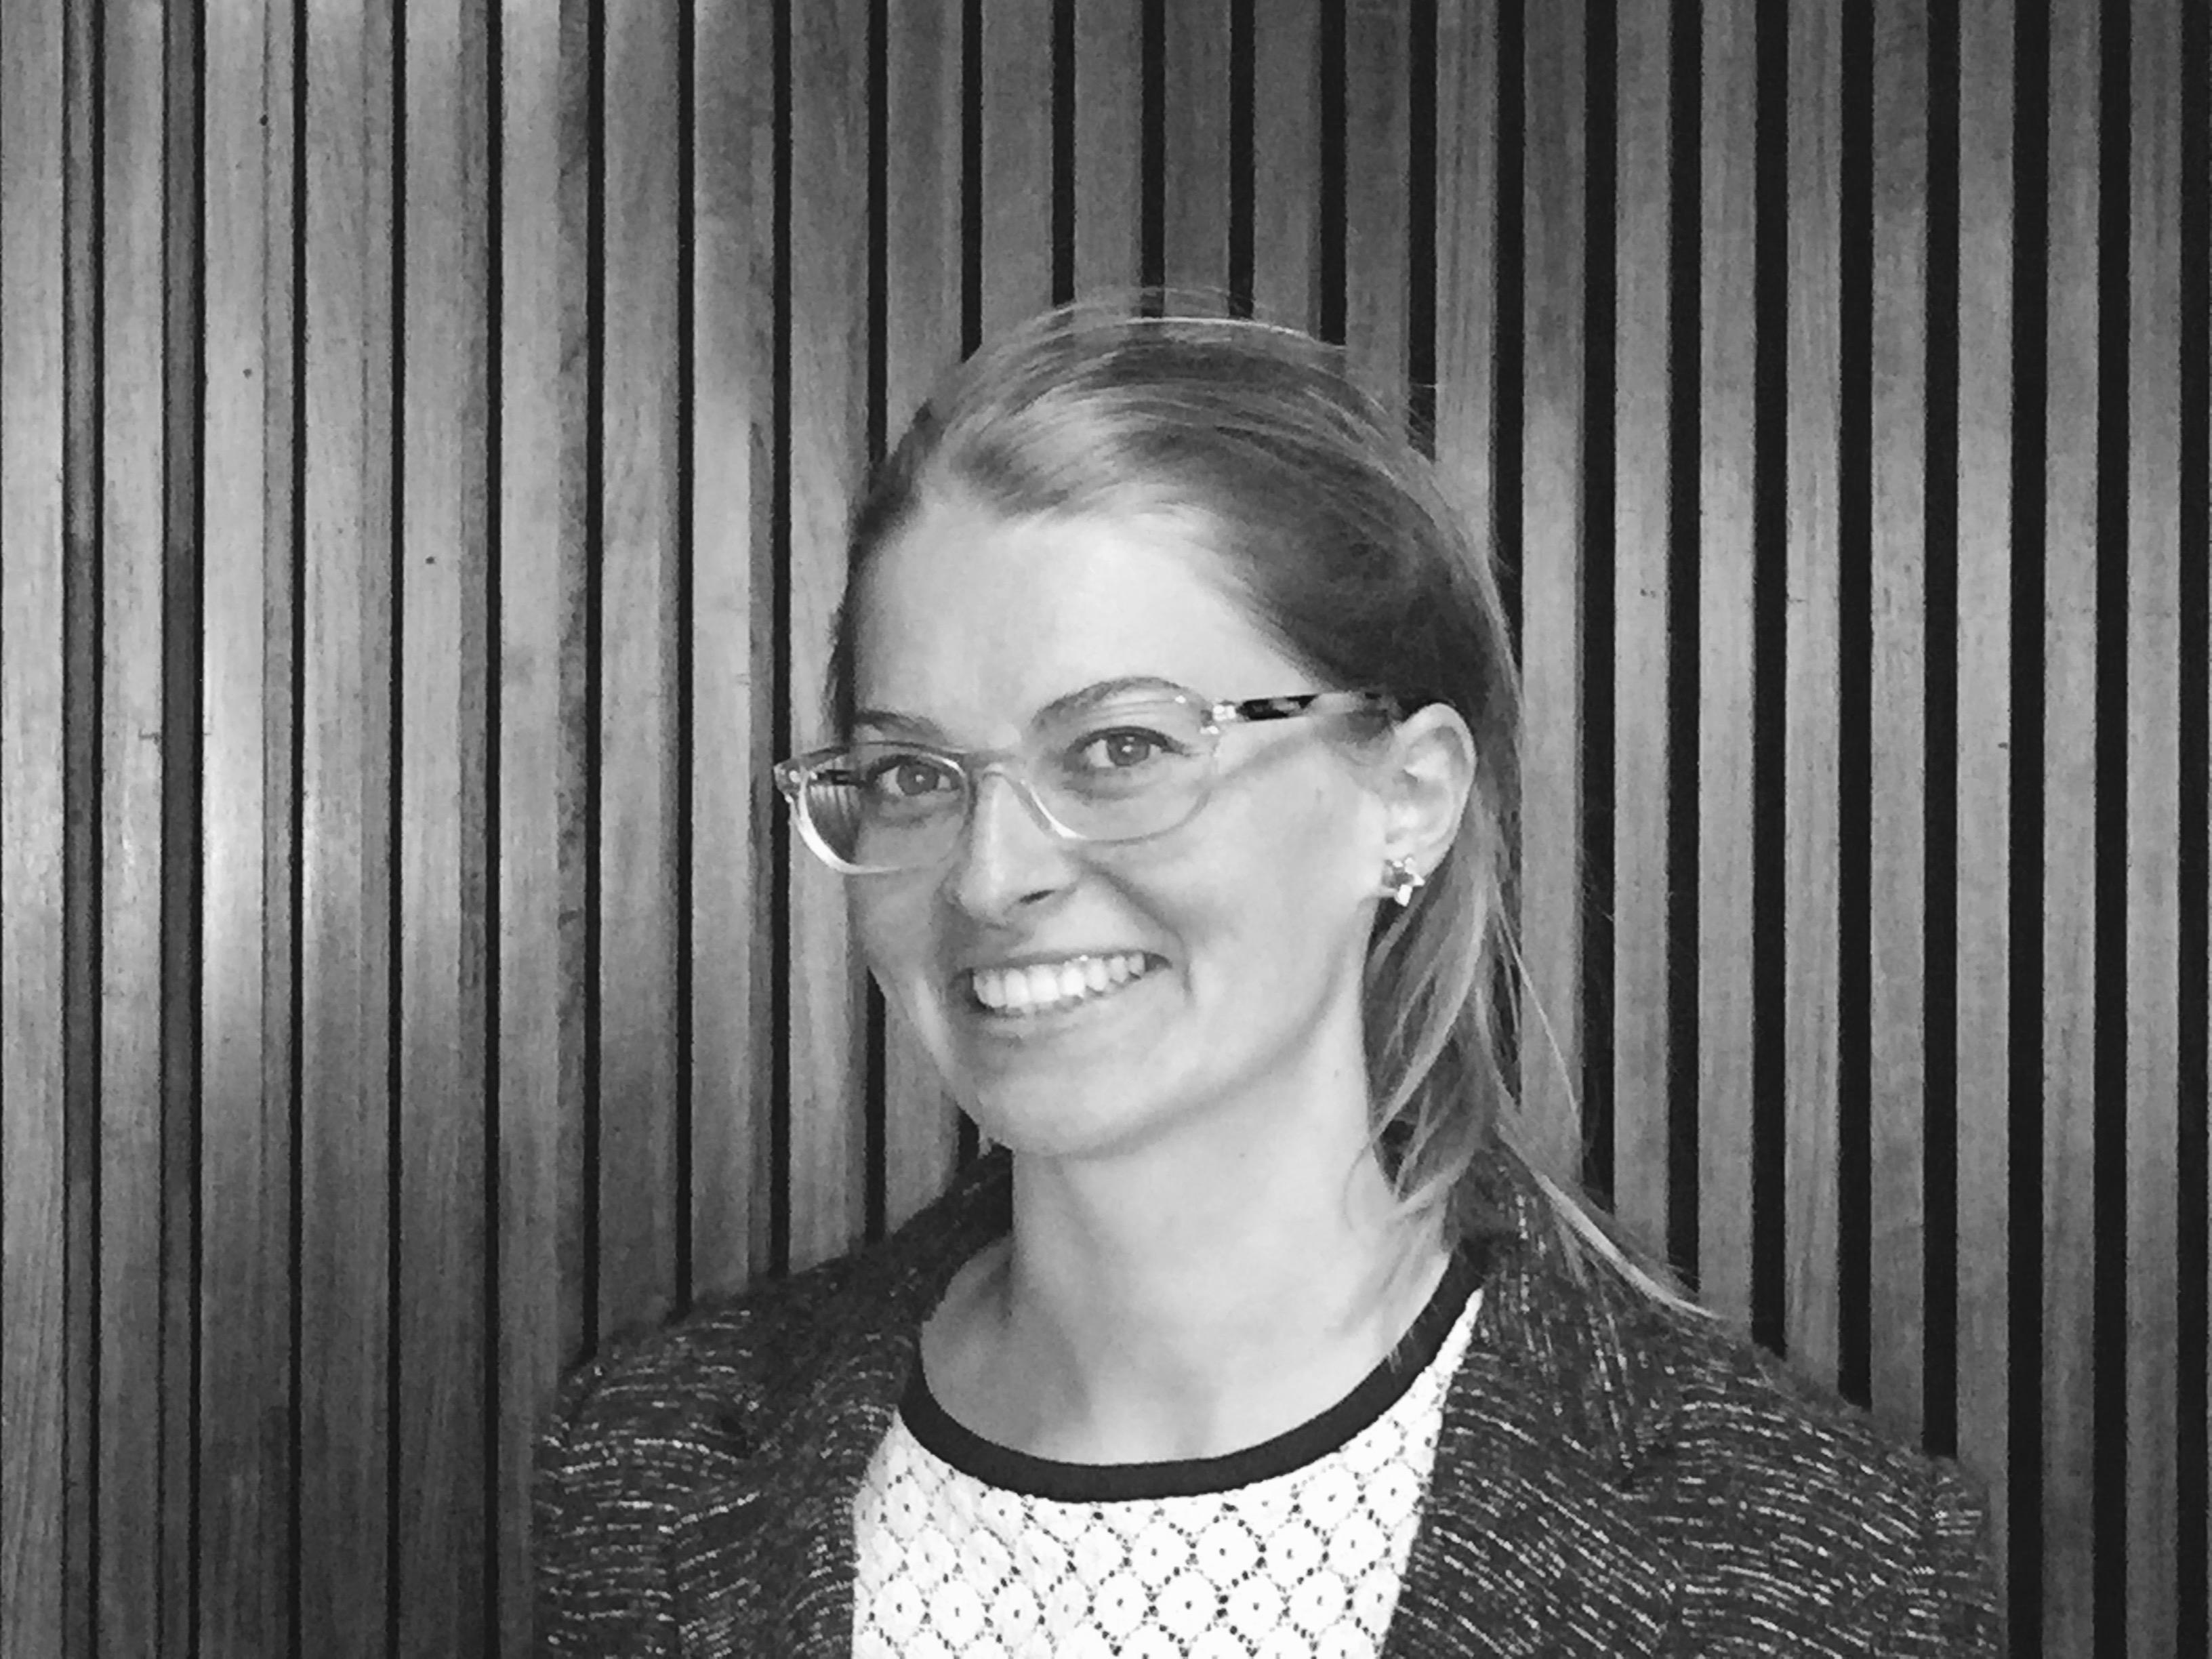 Sabine Joseph - PhD in Cognitive Neurosciences - Subject Matter Expert from Kolabtree